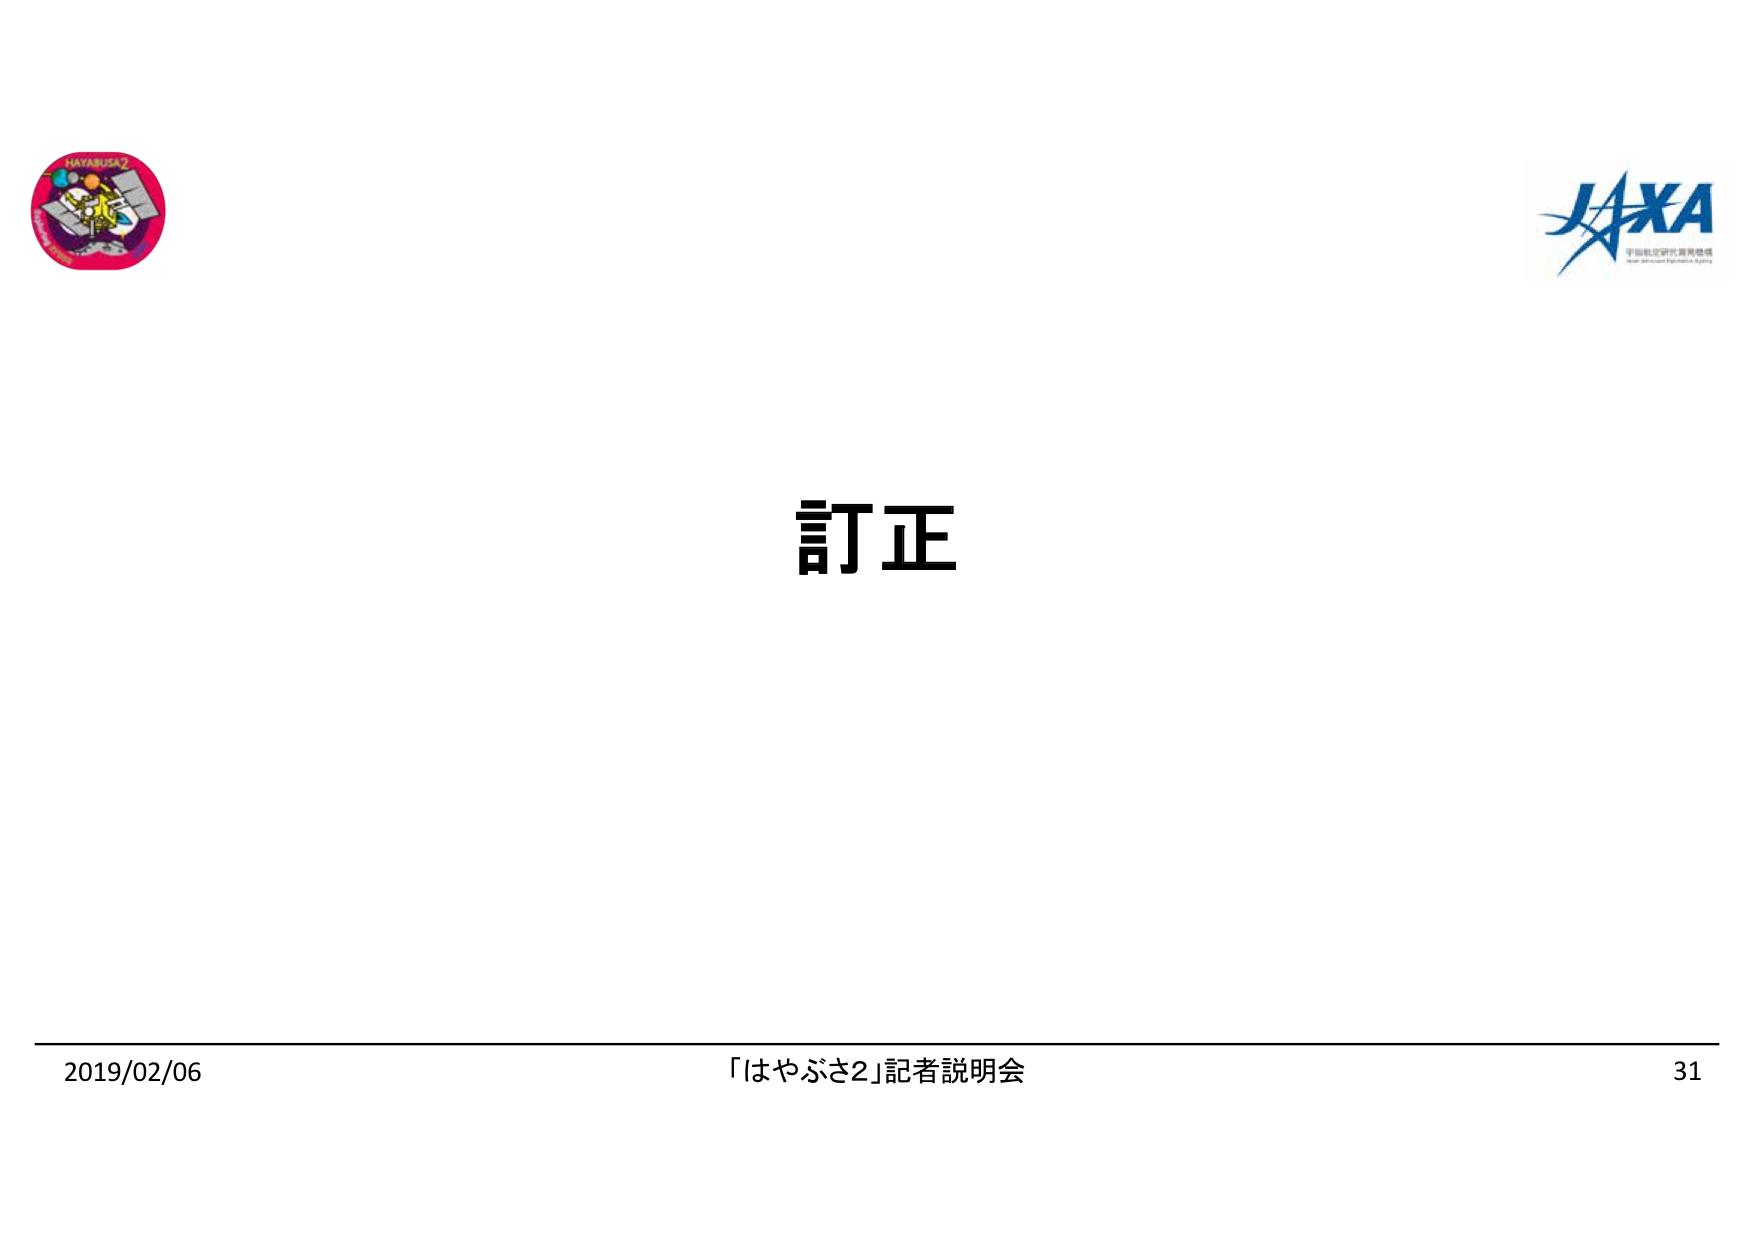 f:id:Imamura:20190204175525p:plain